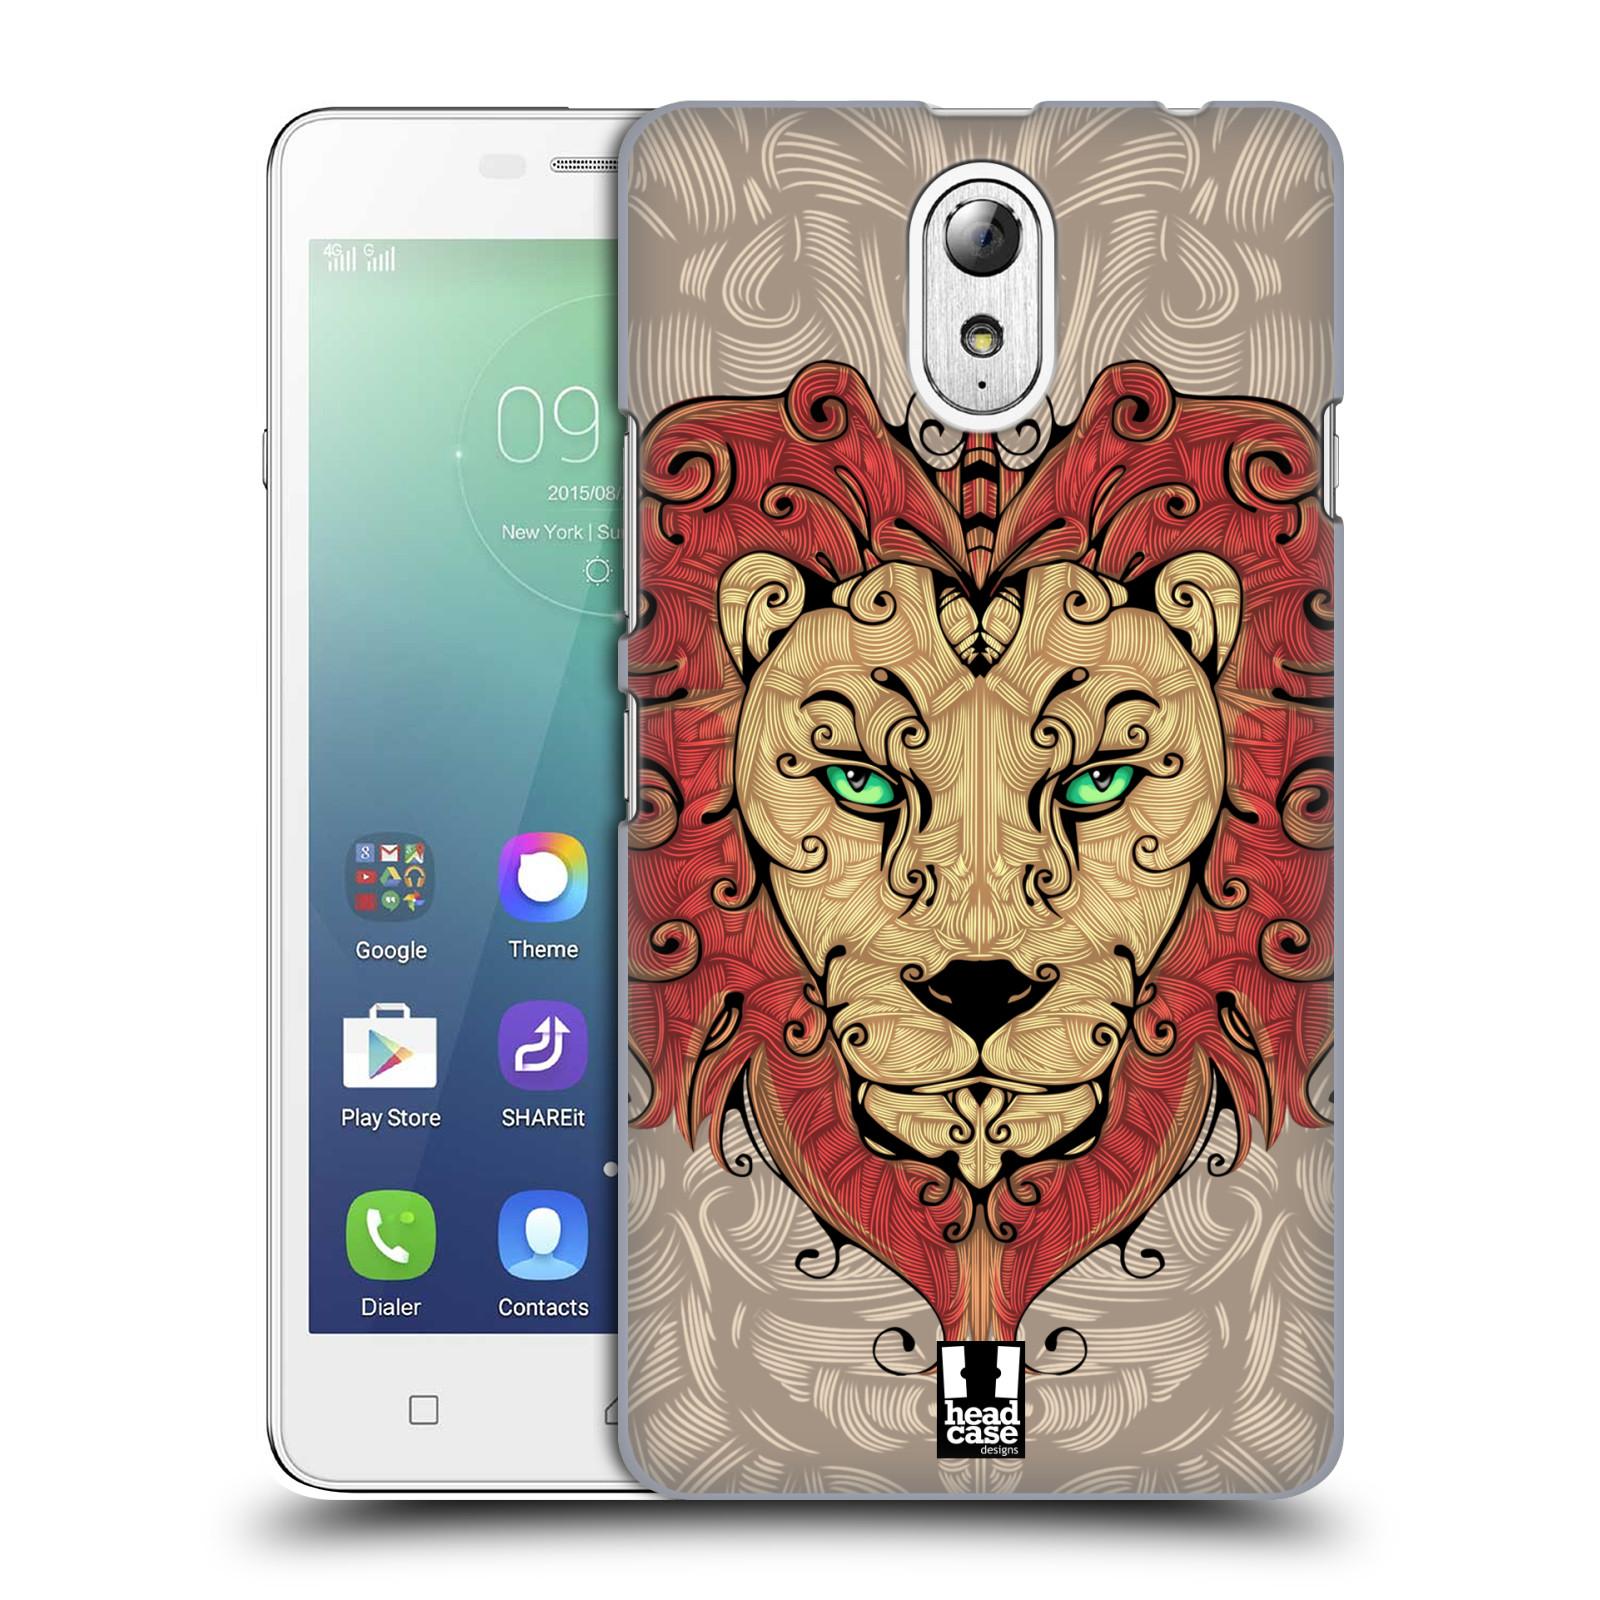 HEAD CASE pevný plastový obal na mobil LENOVO VIBE P1m / LENOVO VIBE p1m DUAL SIM vzor kudrlinky zvíře lev